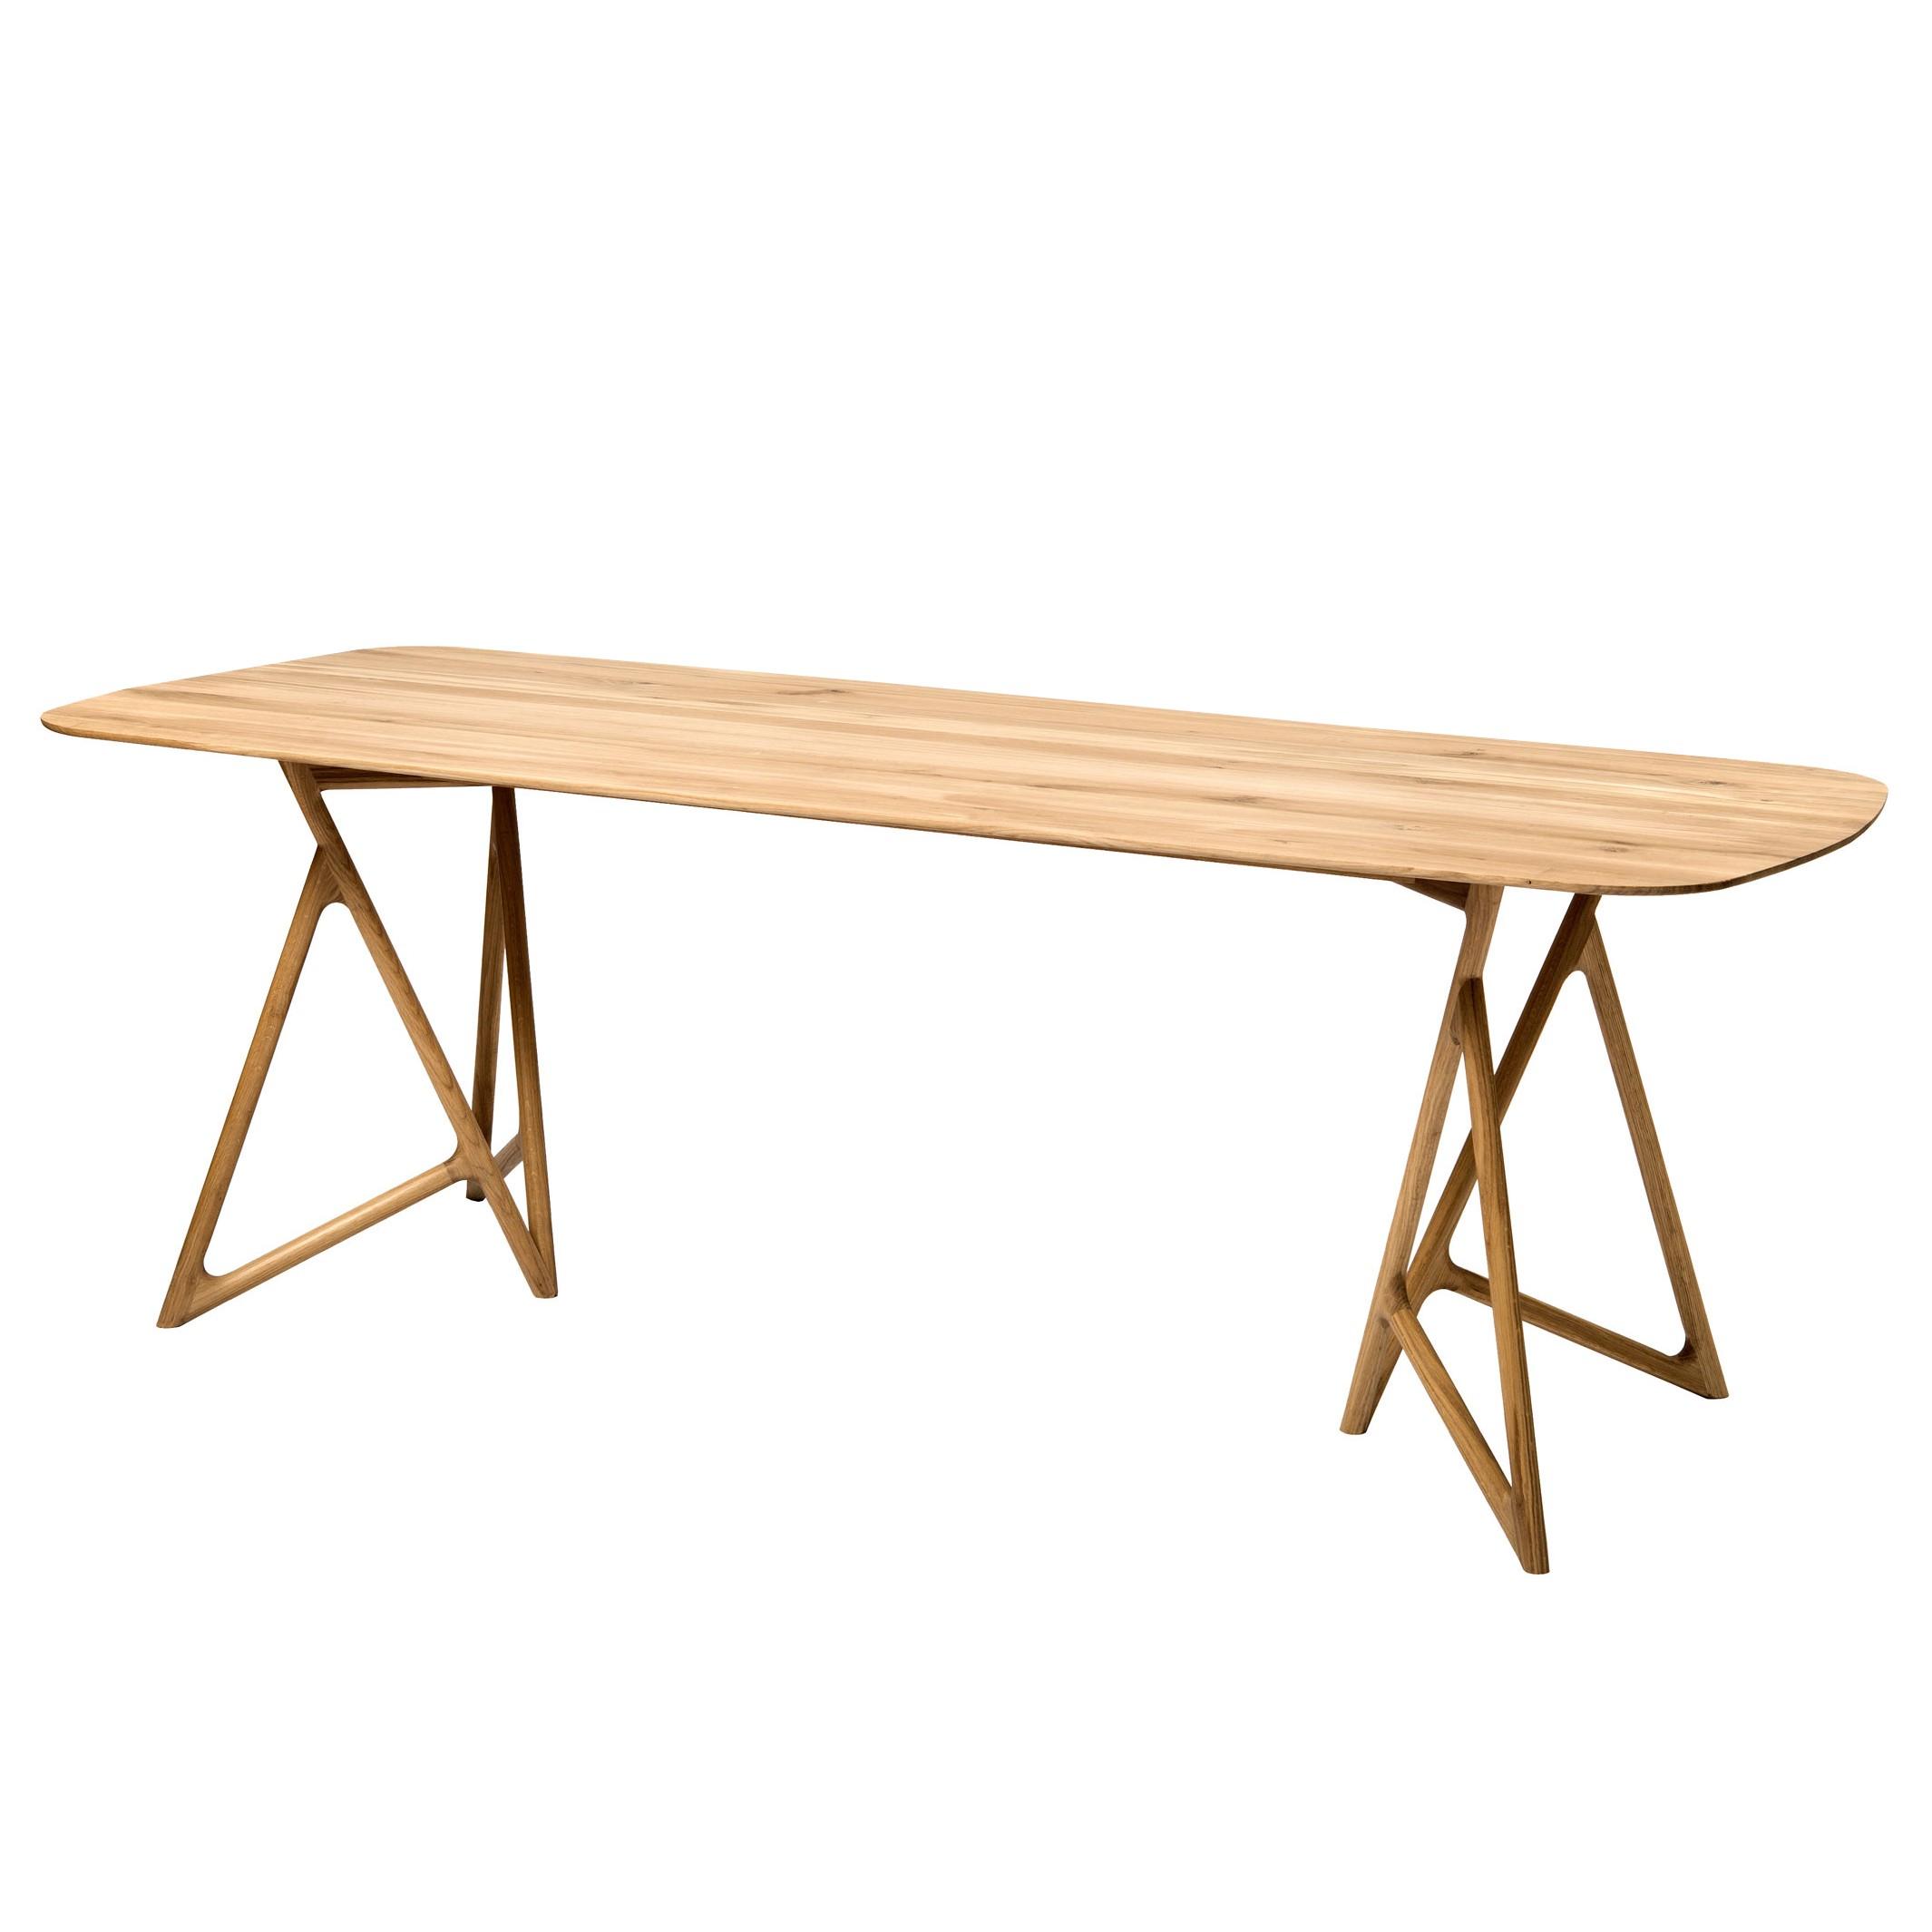 Table à manger Koza - Chêne massif - Chêne - 160 x 90 cm, Studio Copenhagen